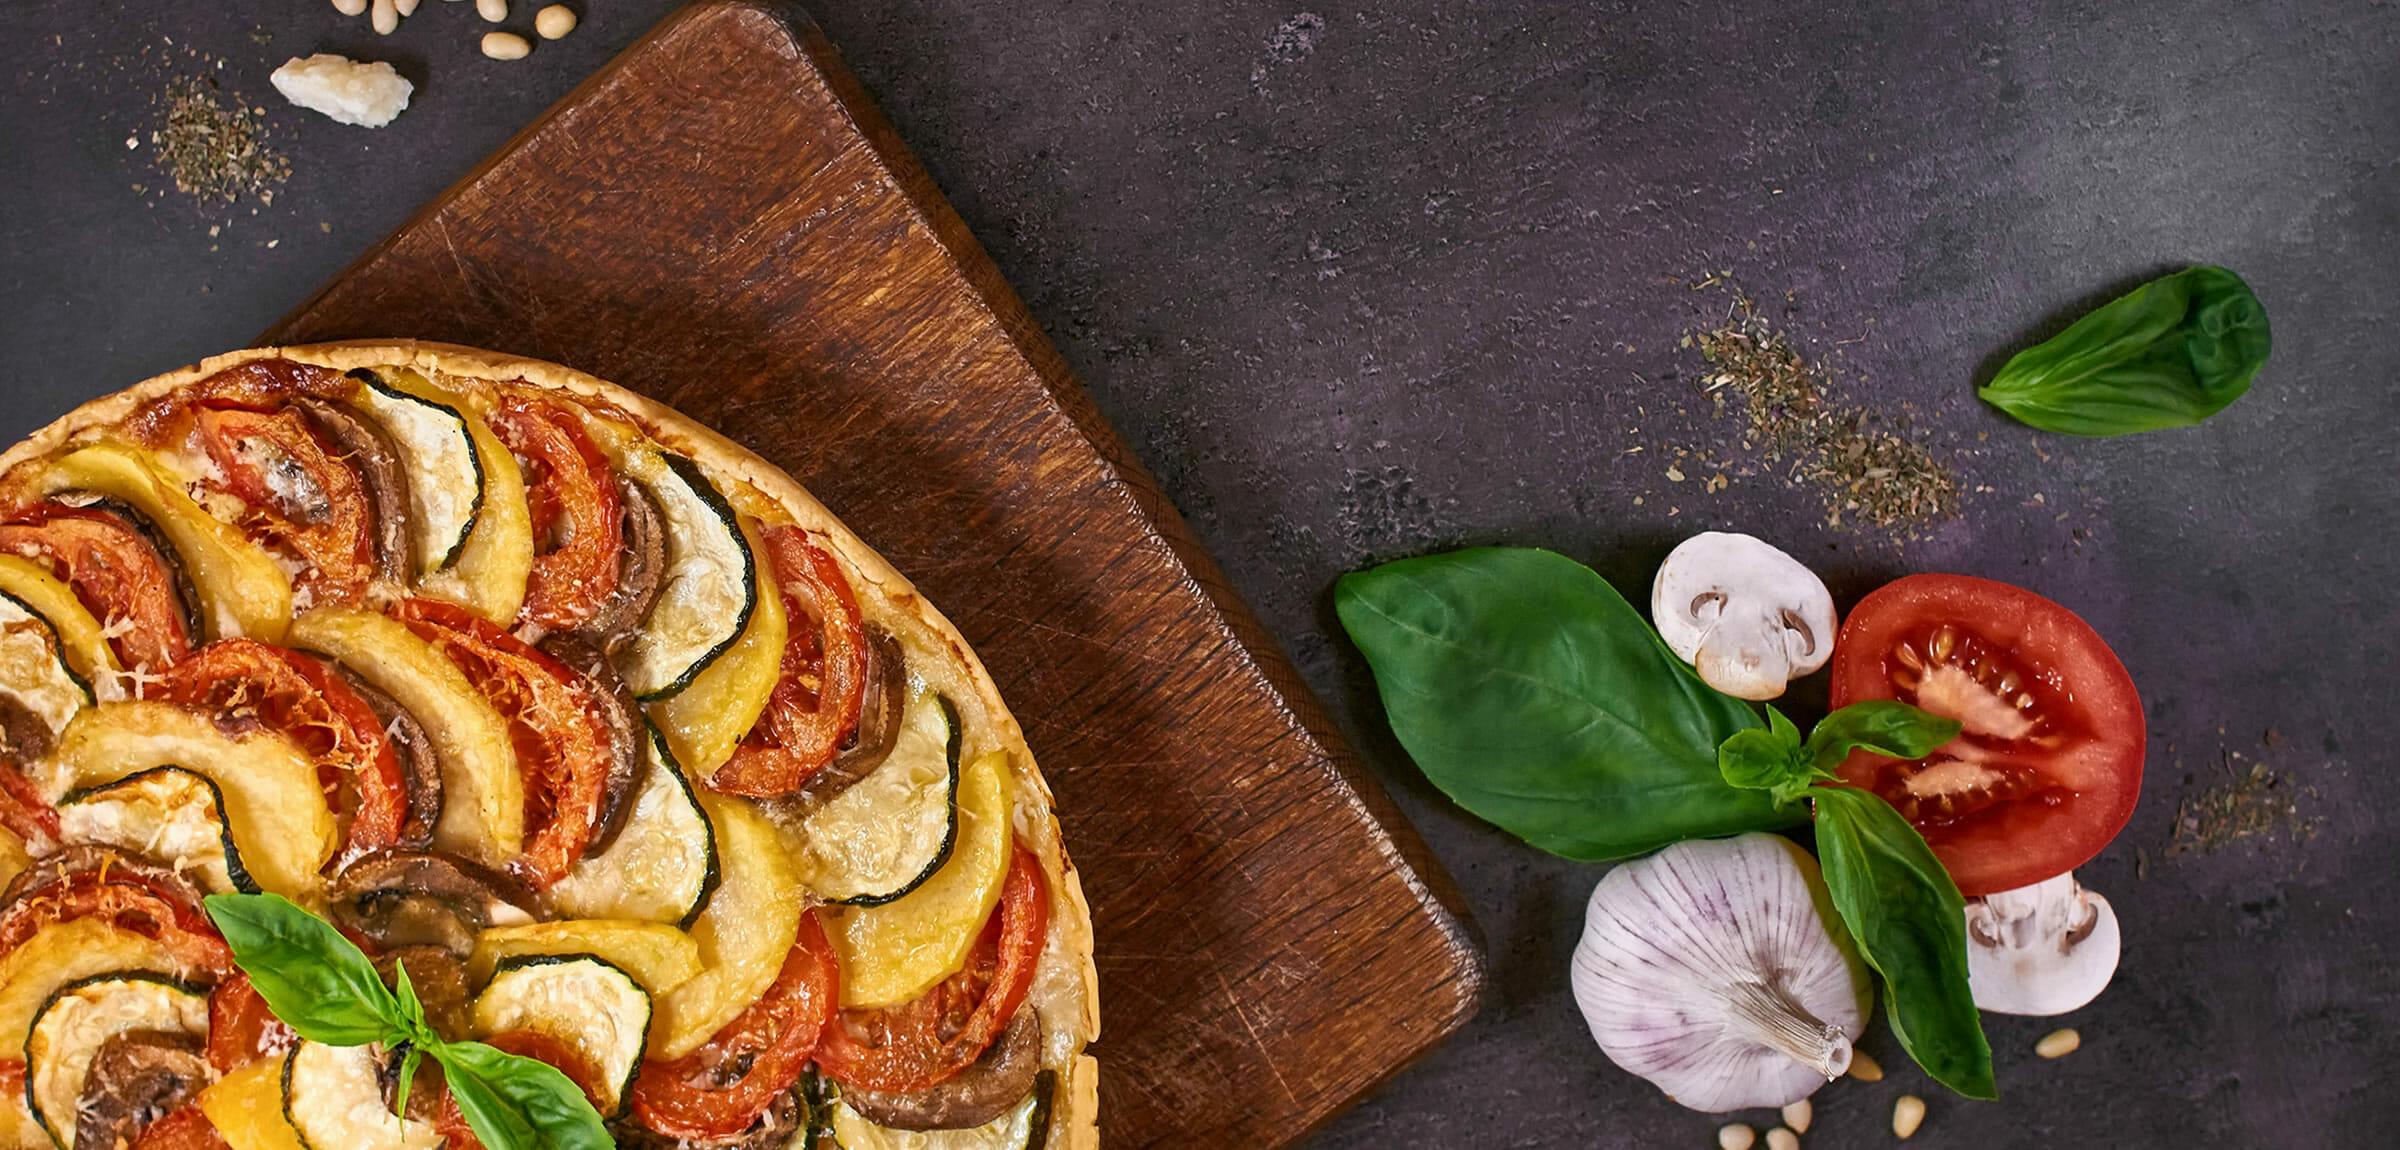 Fresh 'n Fit Cuisine Review